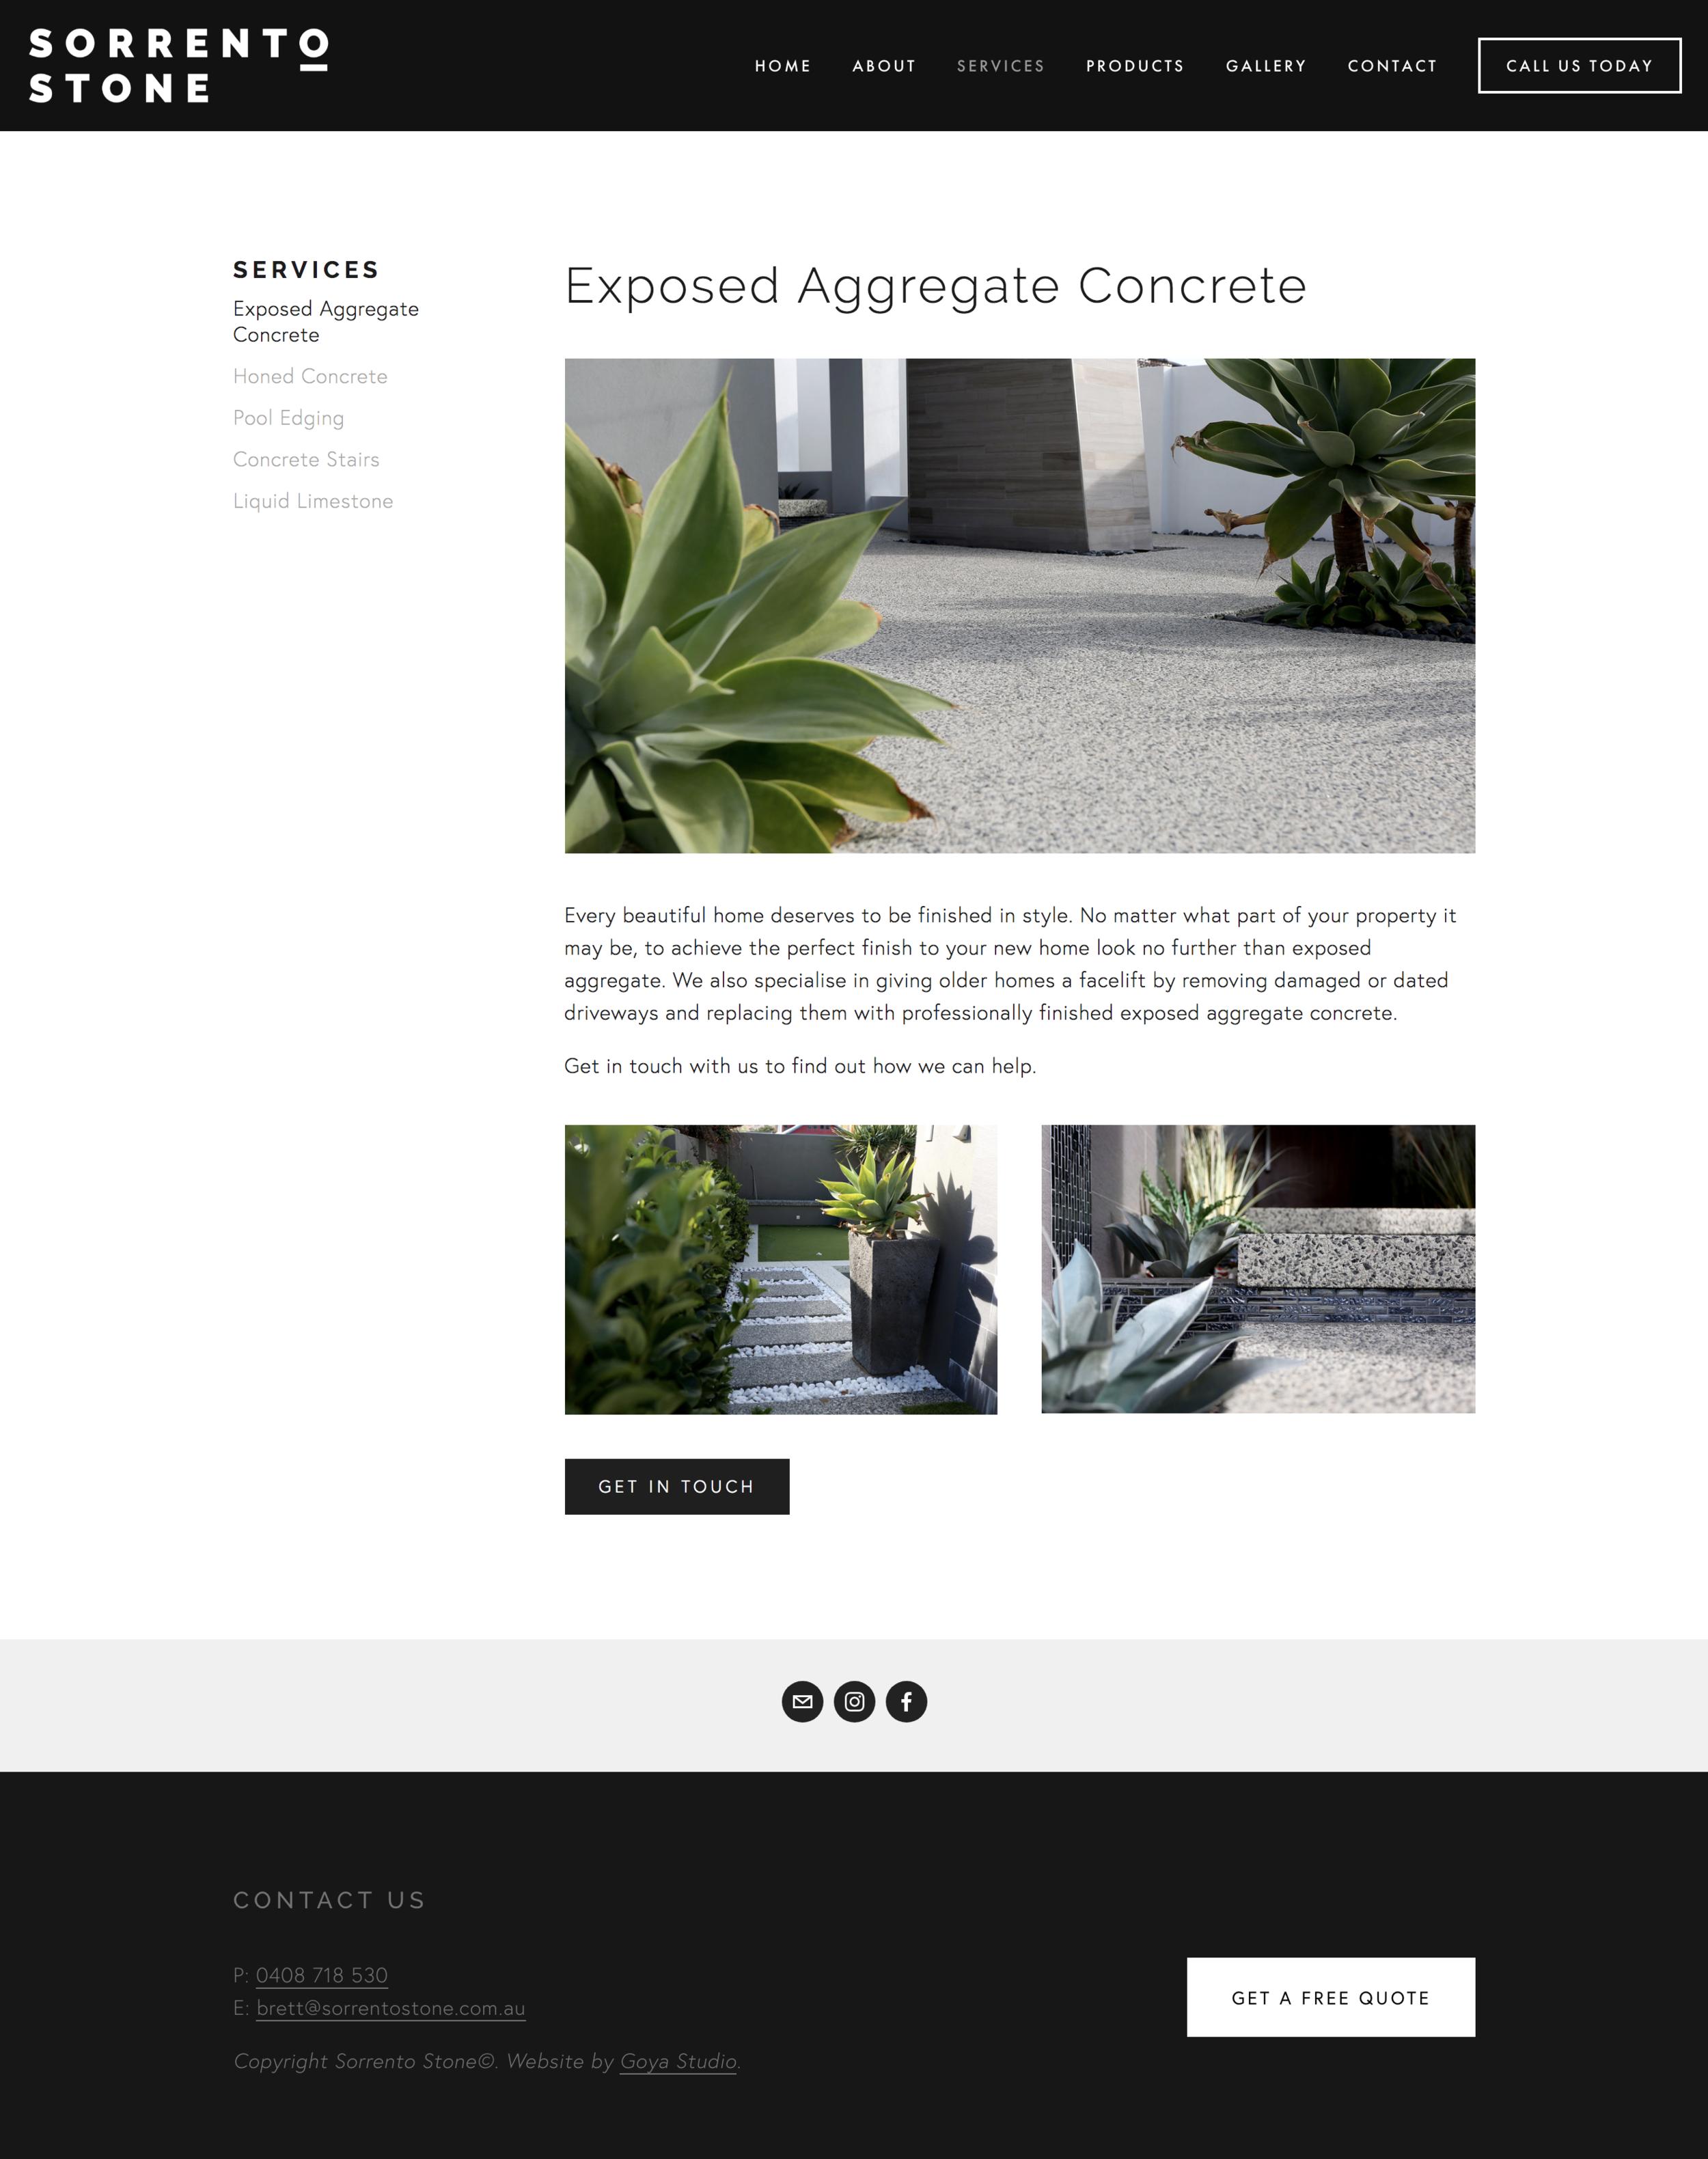 screencapture-sorrentostone-au-exposed-aggregate-concrete-1516598771992.png